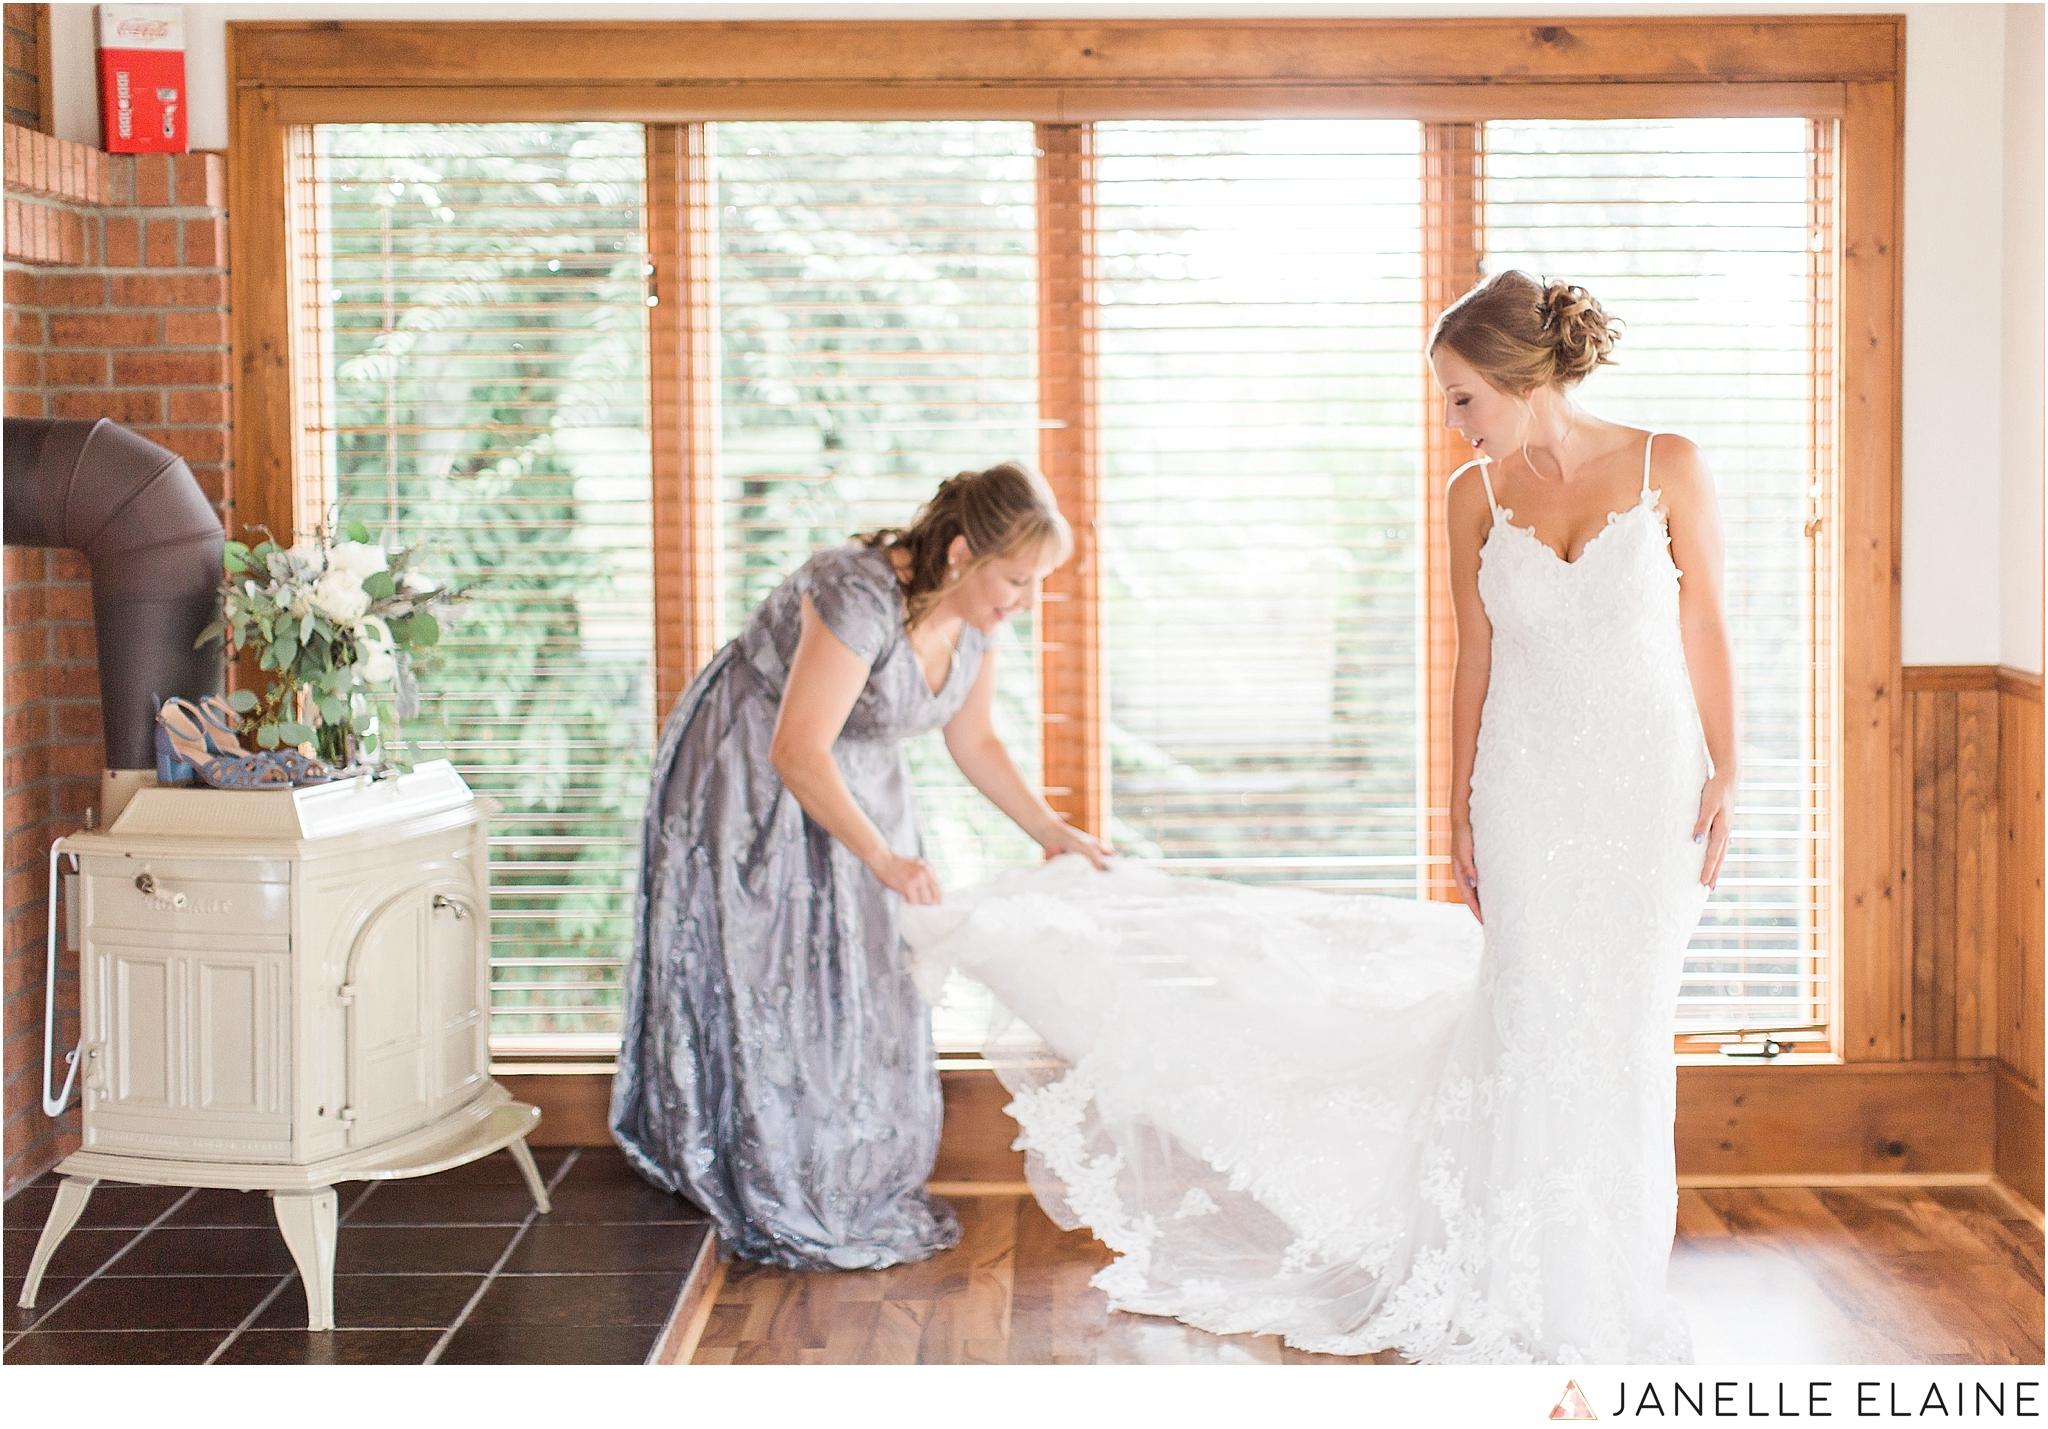 warnsholz-wedding-michigan-photography-janelle elaine photography-25.jpg